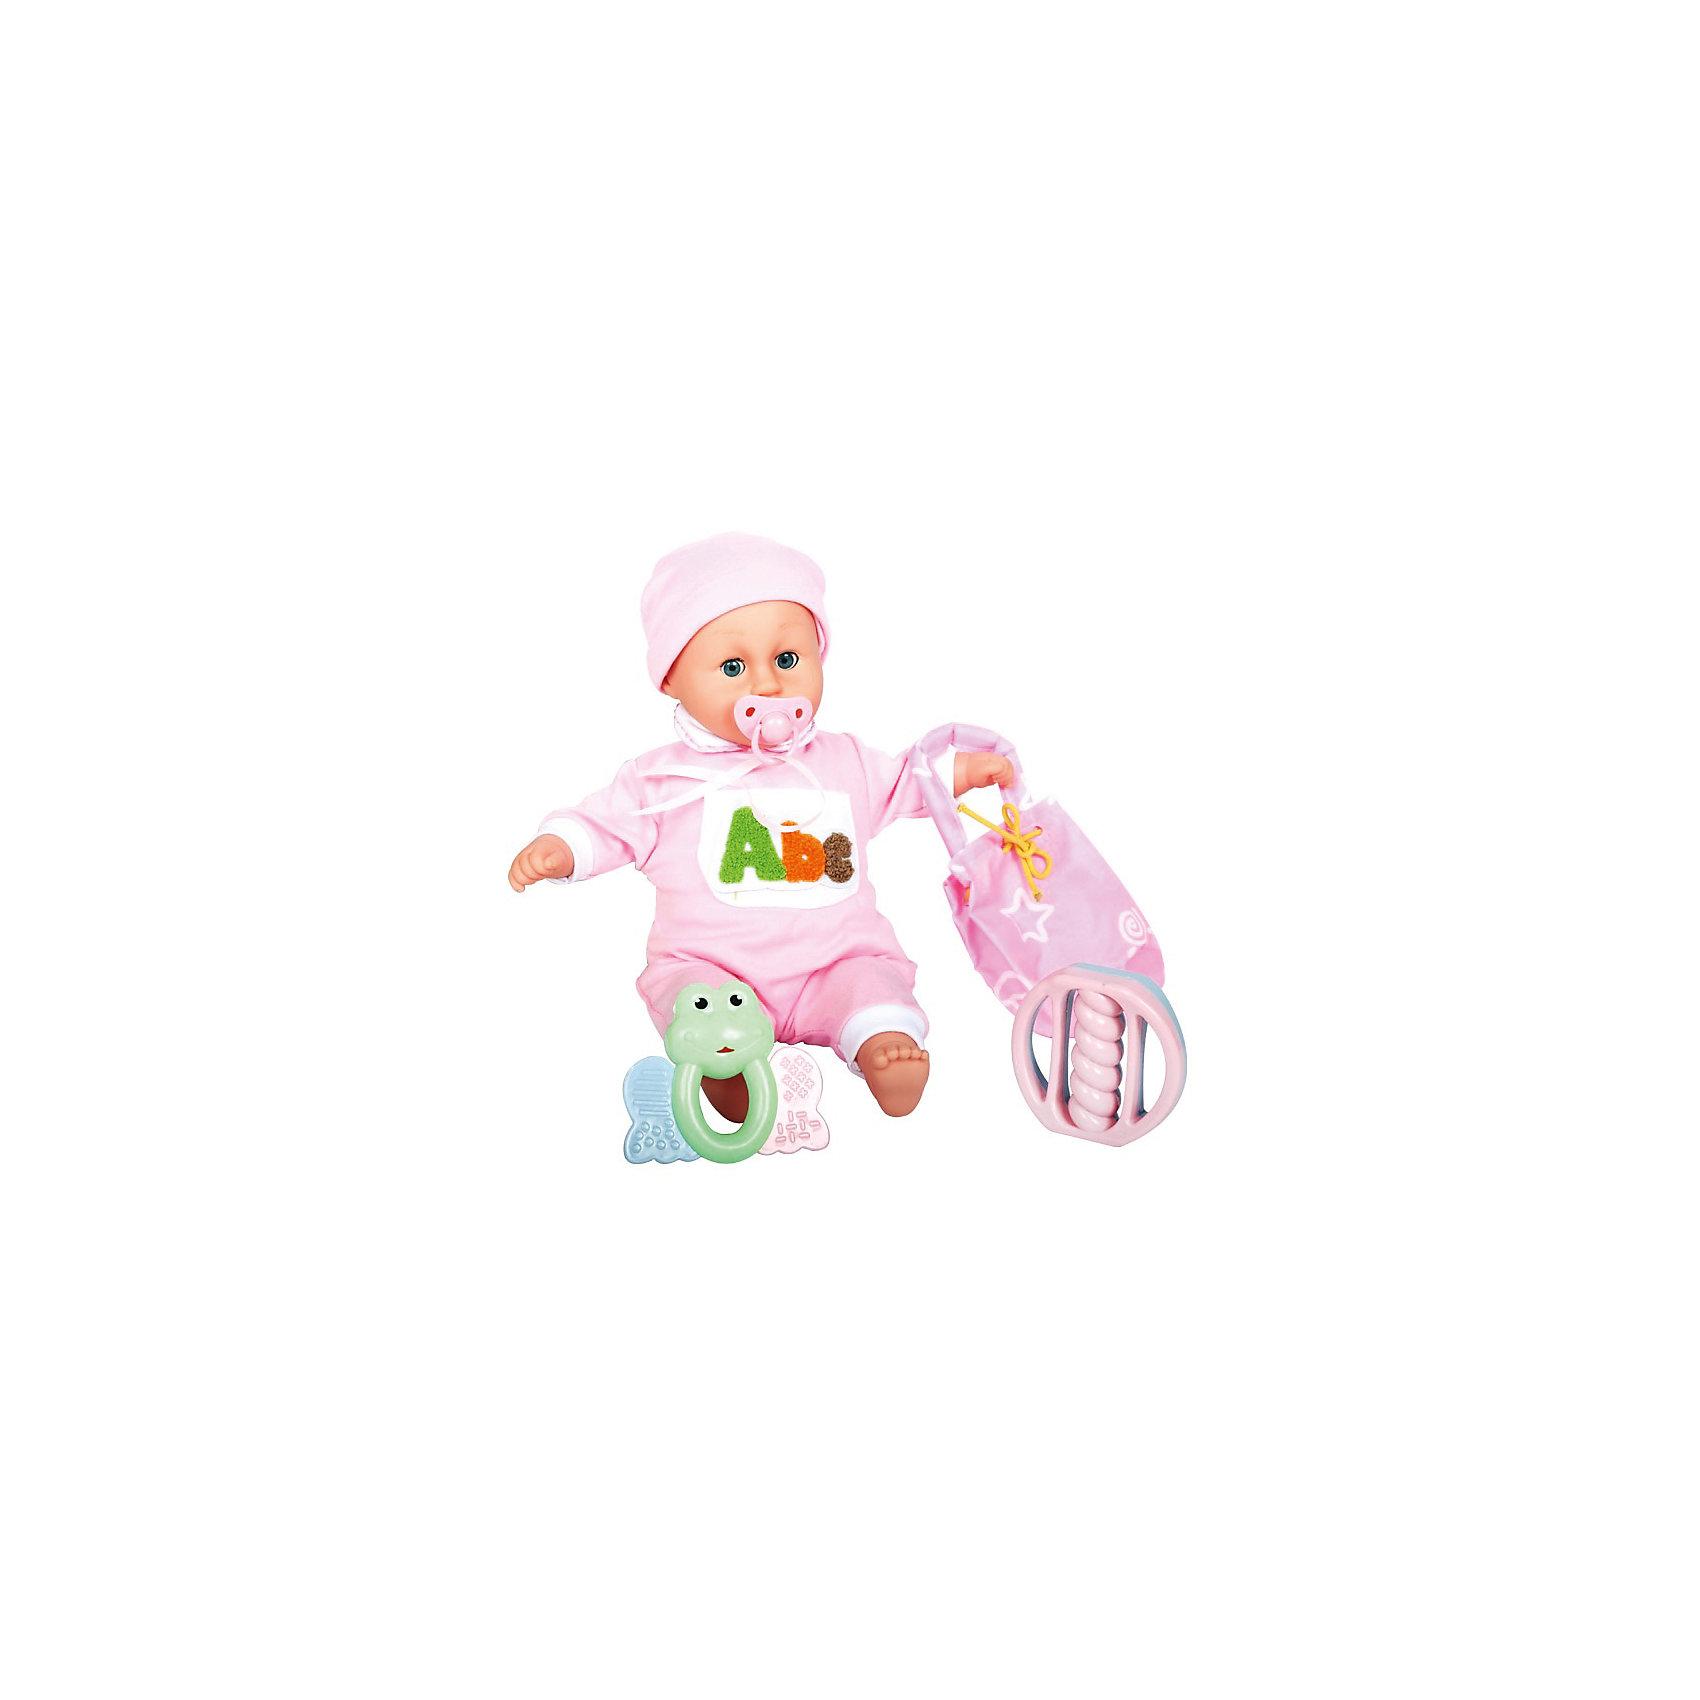 Интерактивная кукла-младенец Моя малышка, 42 см, DollyToyКуклы-пупсы<br><br><br>Ширина мм: 410<br>Глубина мм: 155<br>Высота мм: 335<br>Вес г: 1275<br>Возраст от месяцев: 36<br>Возраст до месяцев: 72<br>Пол: Женский<br>Возраст: Детский<br>SKU: 5581284